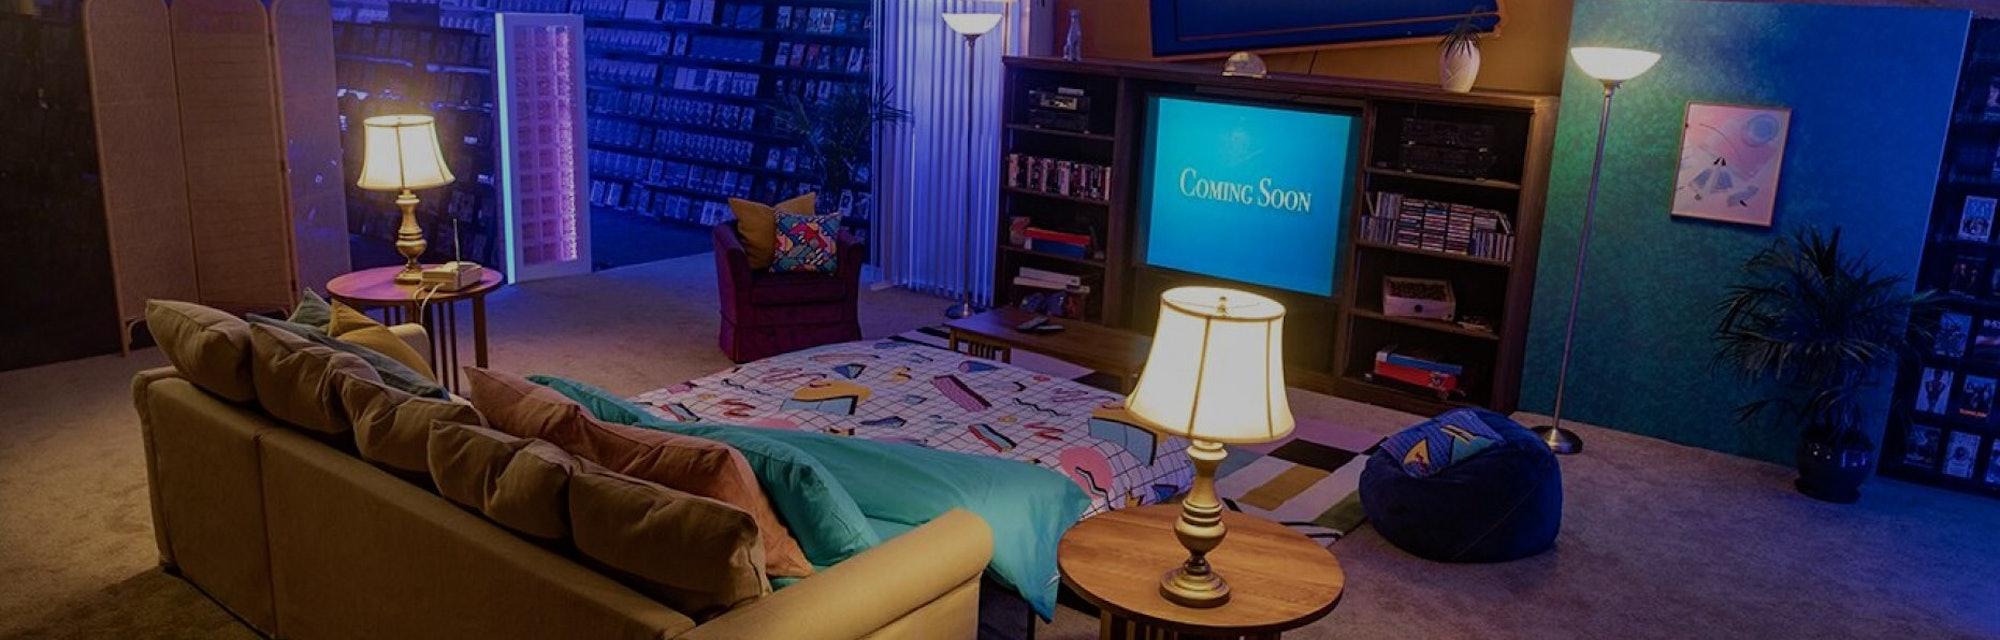 A '90s era living room built in a Blockbuster store.